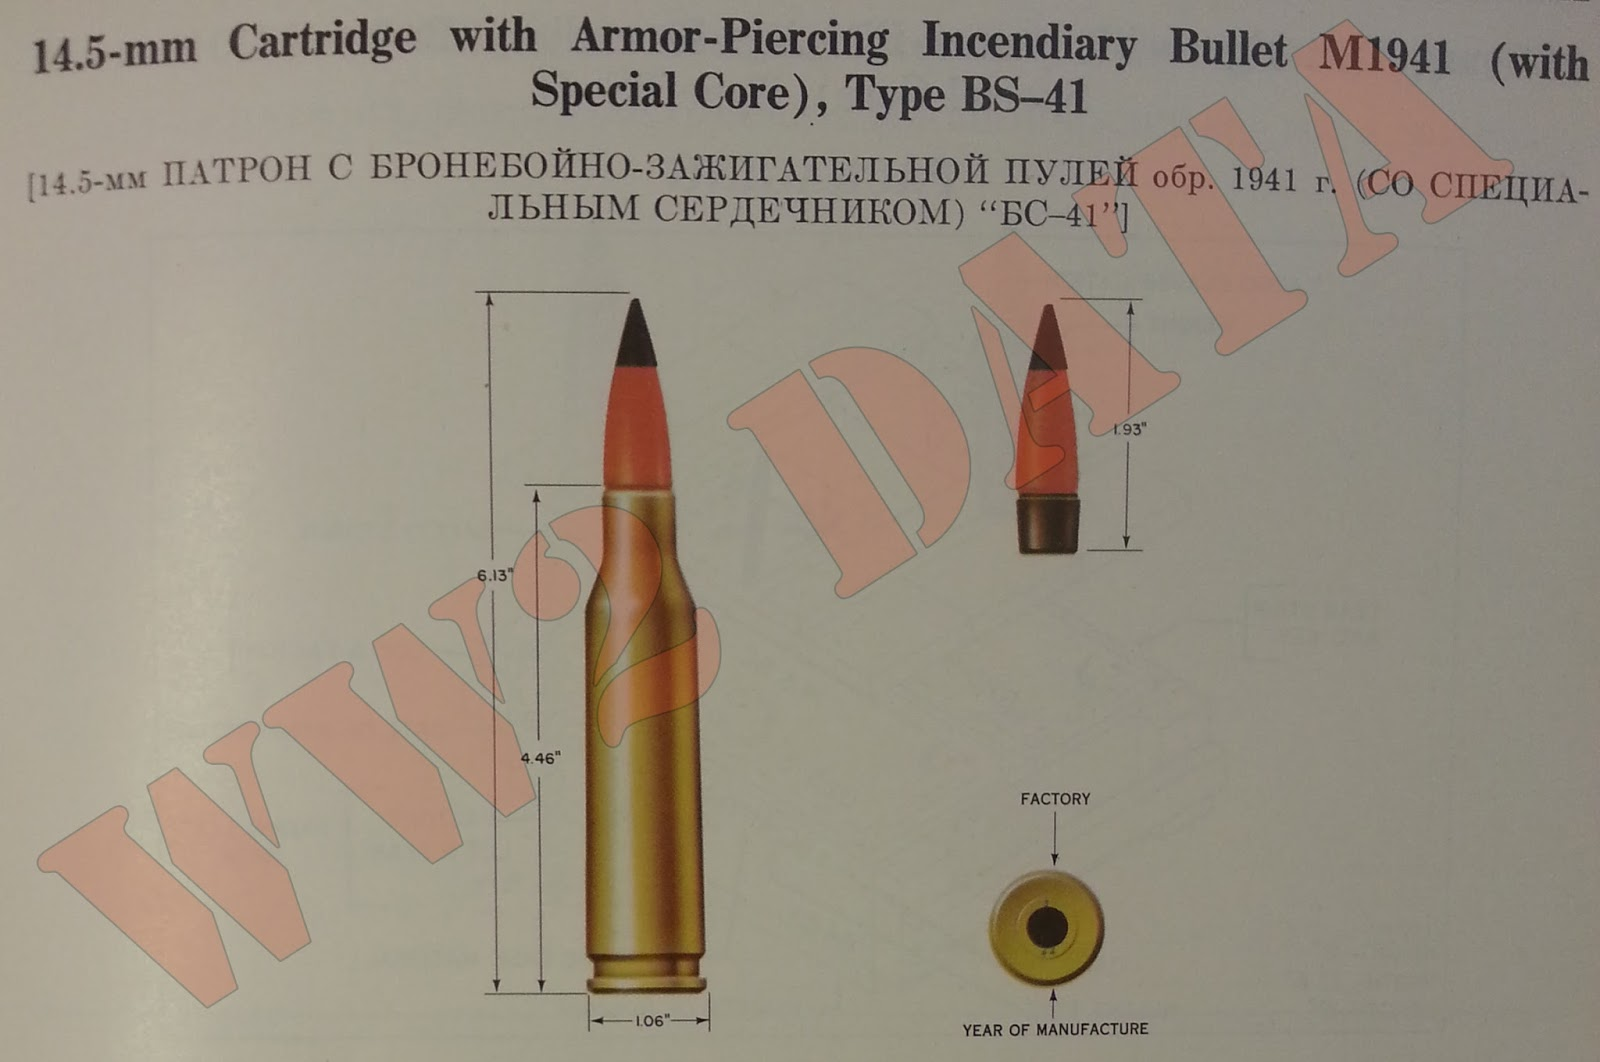 WW2 Equipment Data: Soviet Explosive Ordnance - 14 5mm